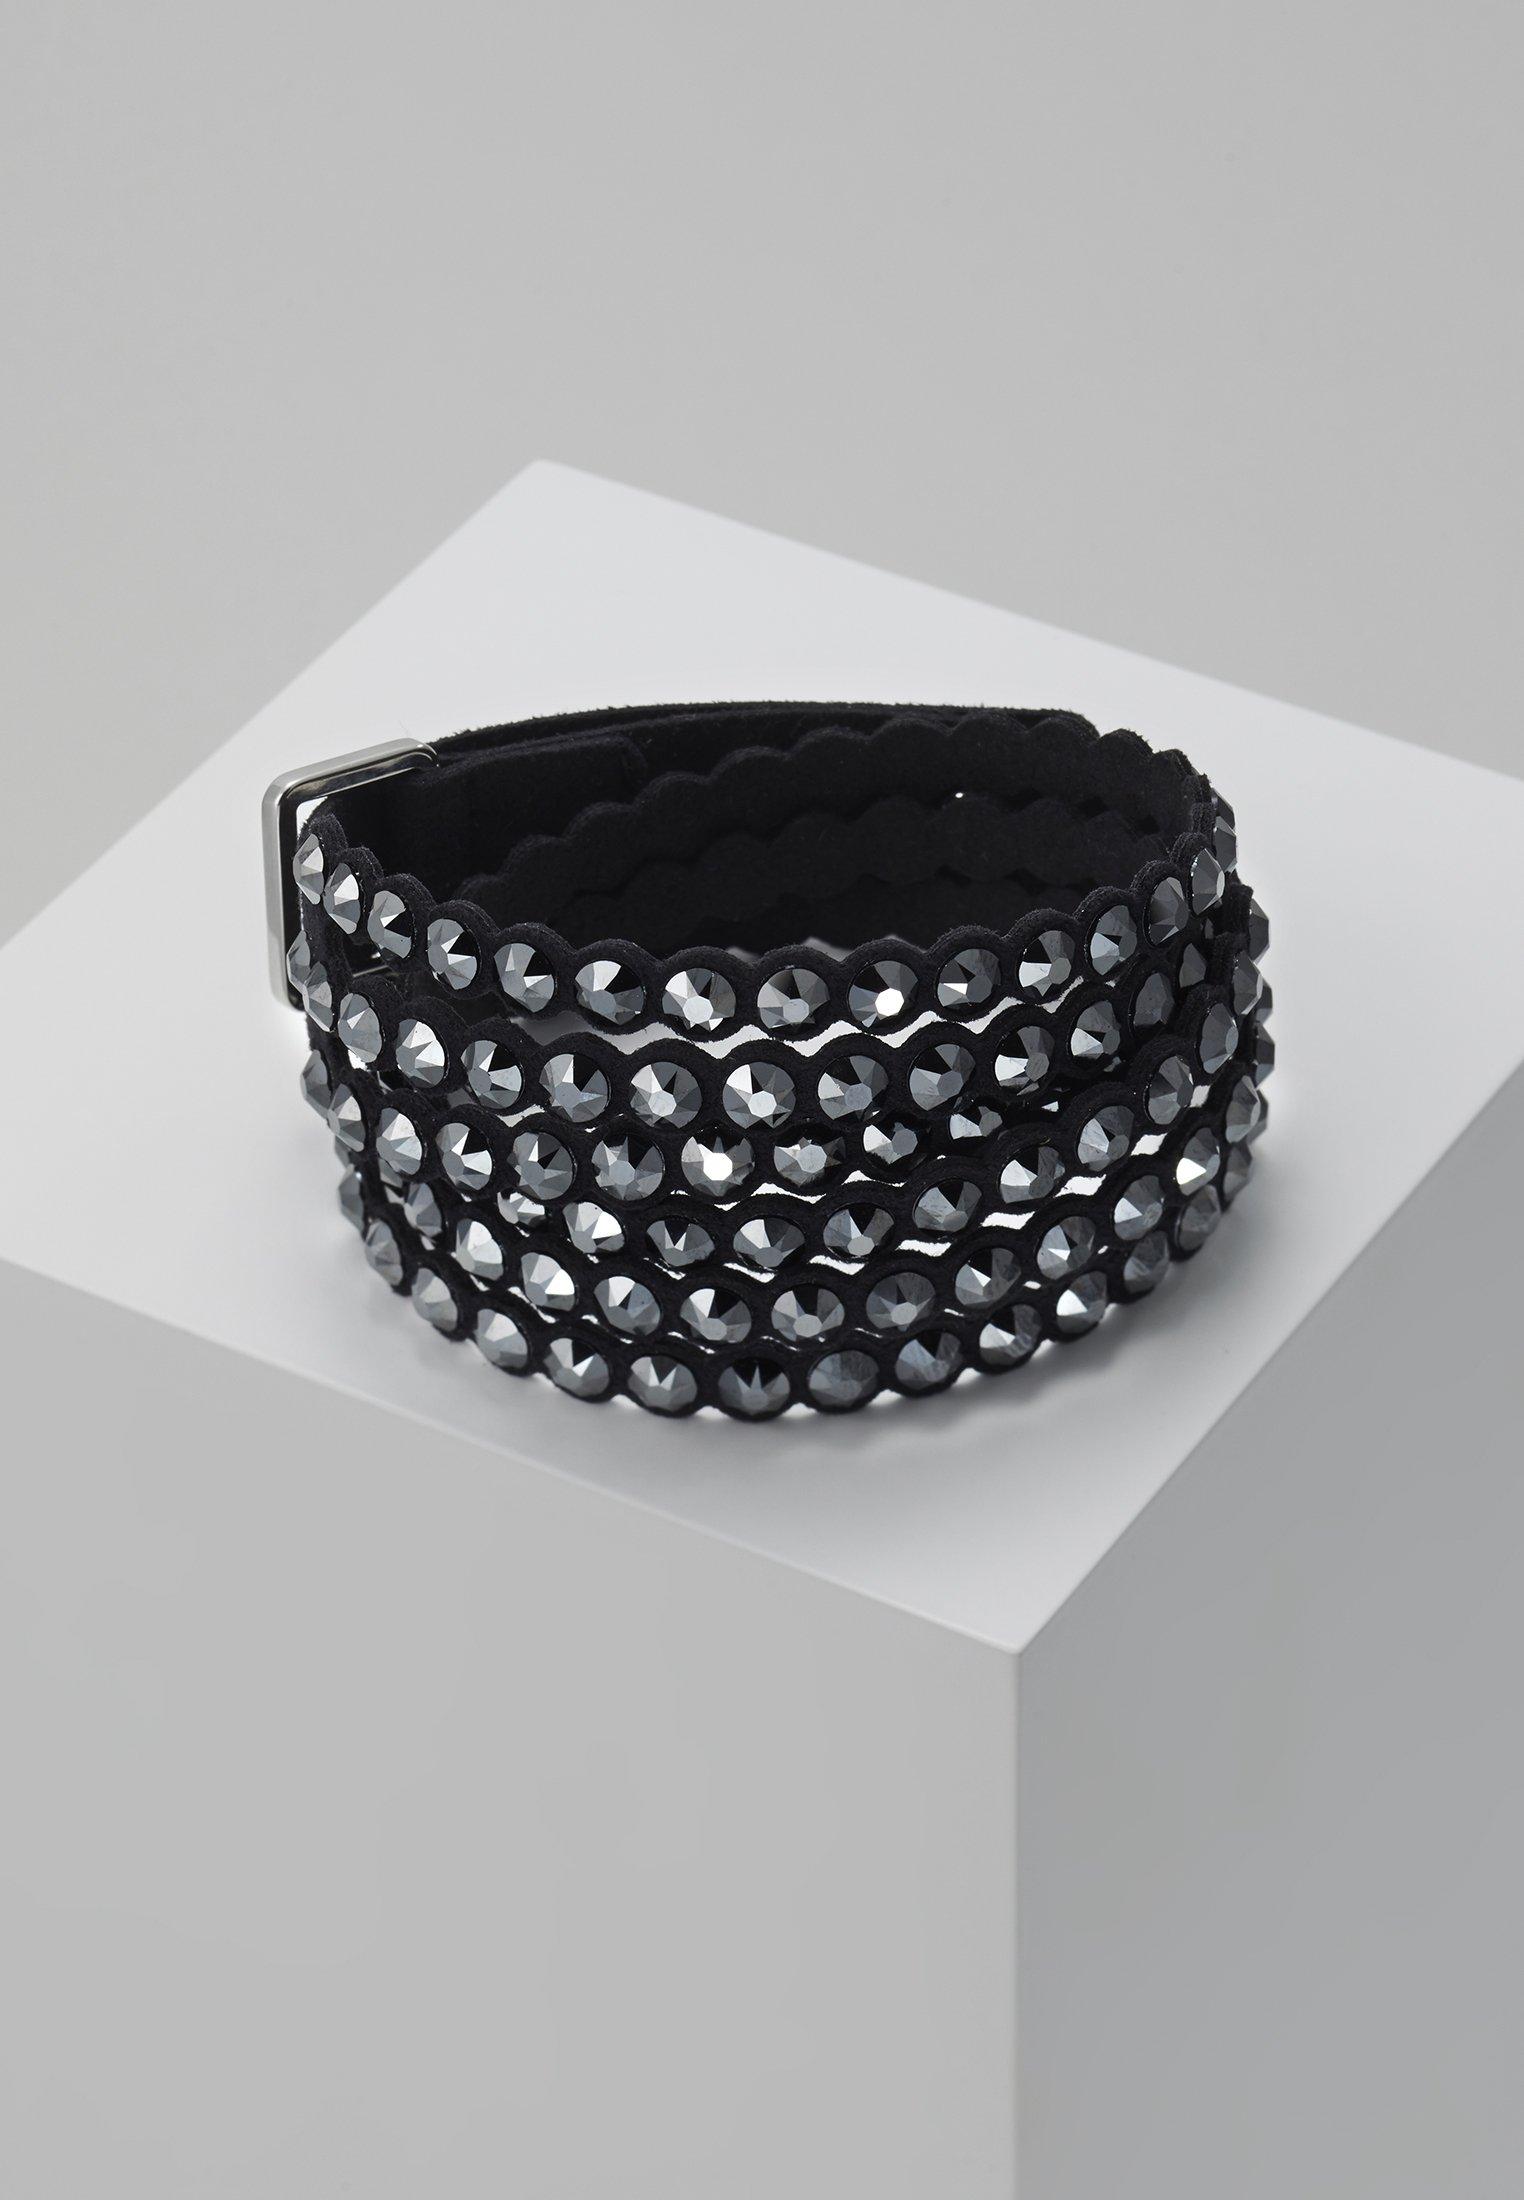 Femme Swarovski crystal - Bracelet